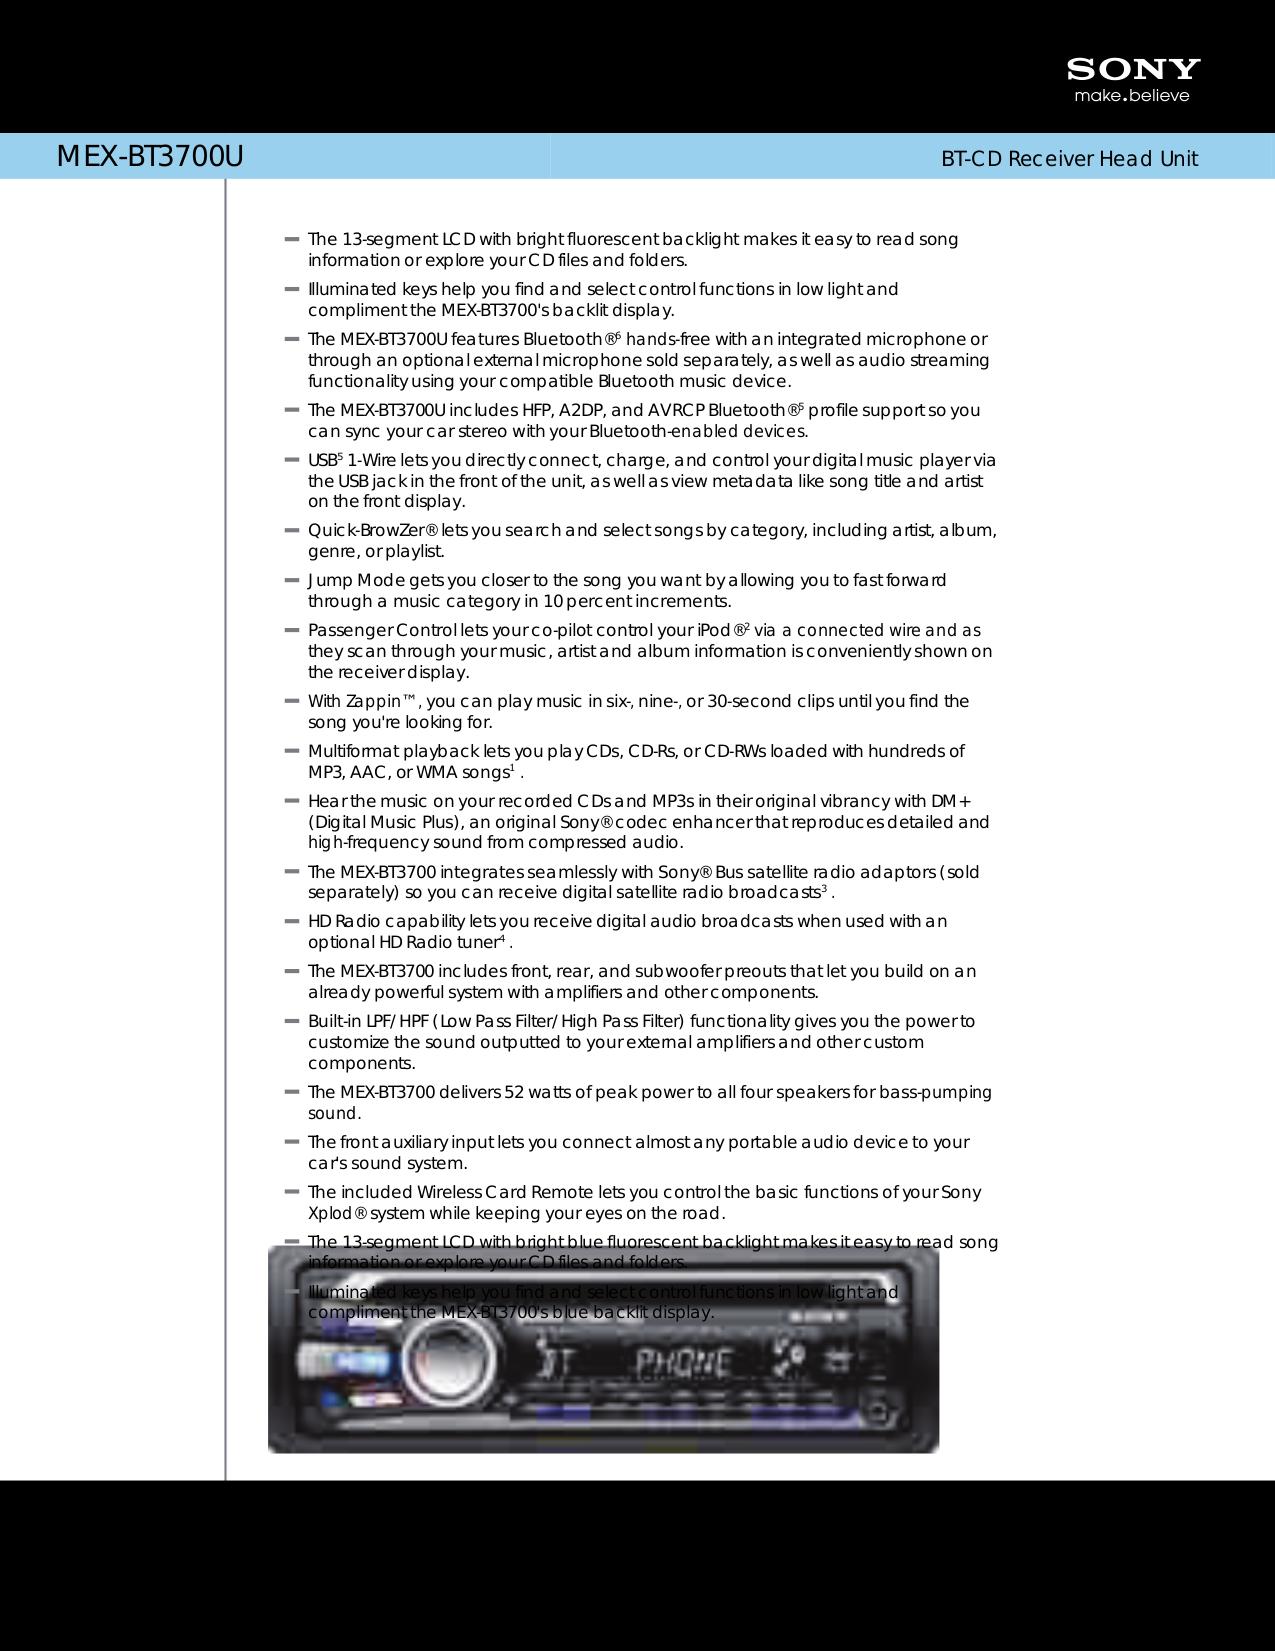 MEXBT3700U_mksp.pdf 0 download free pdf for sony xplod mex bt2700 car receiver manual sony mex-bt2700 manual pdf at n-0.co